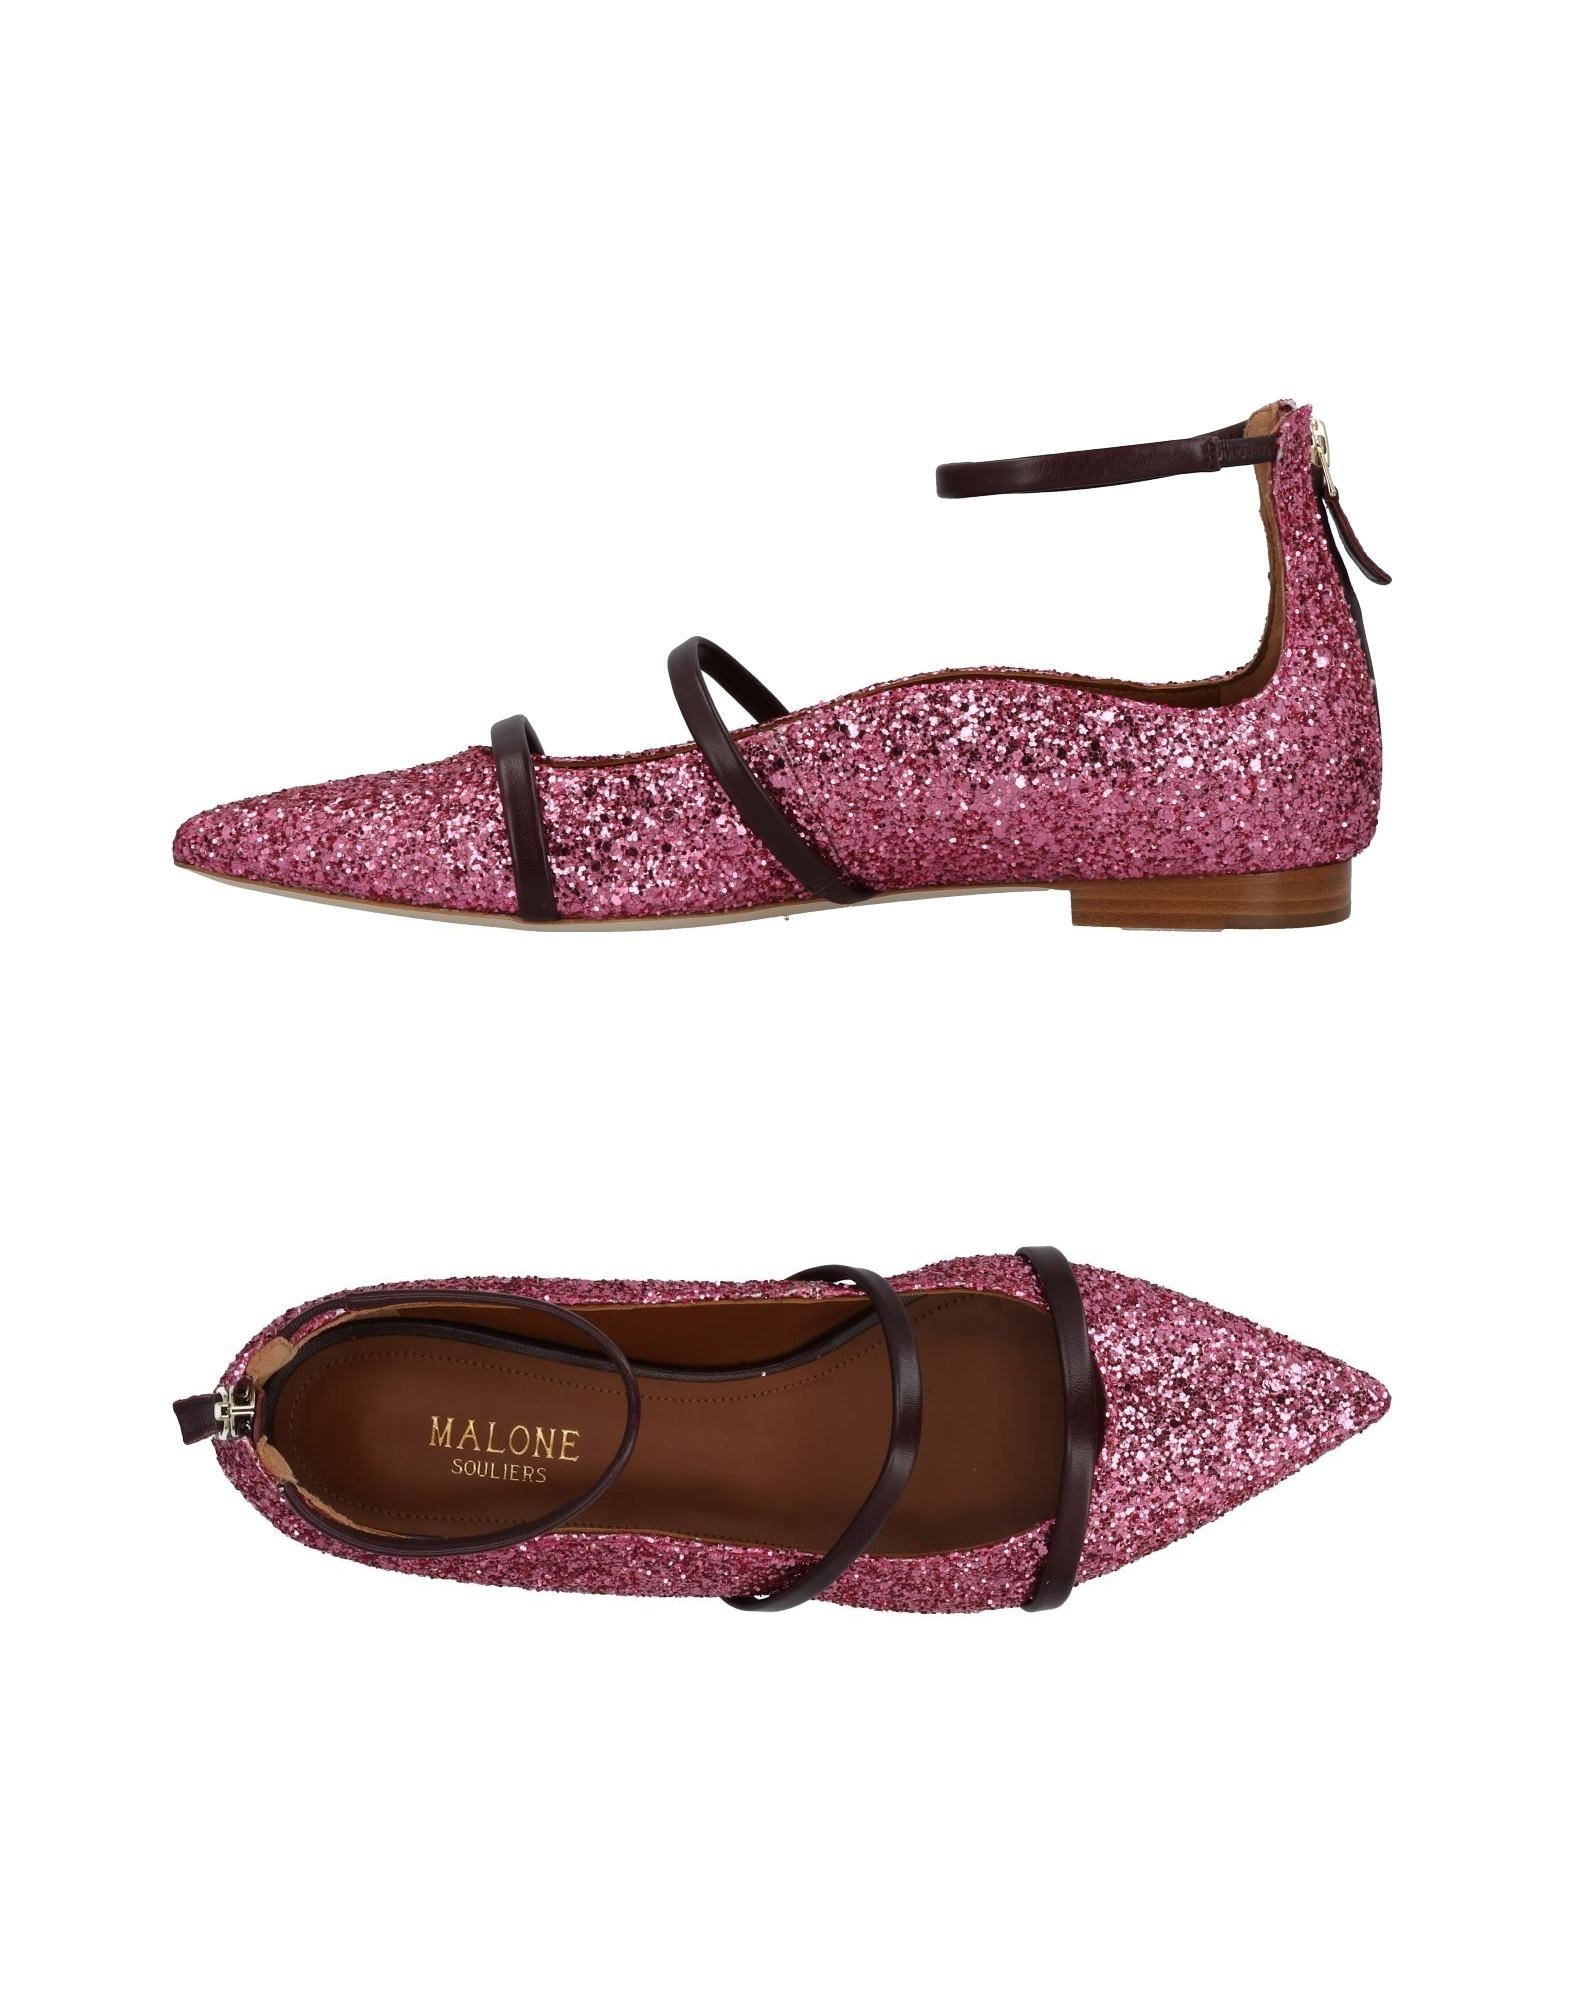 Rabatt Damen Schuhe Malone Souliers Ballerinas Damen Rabatt  11453248UB 0c3e8e